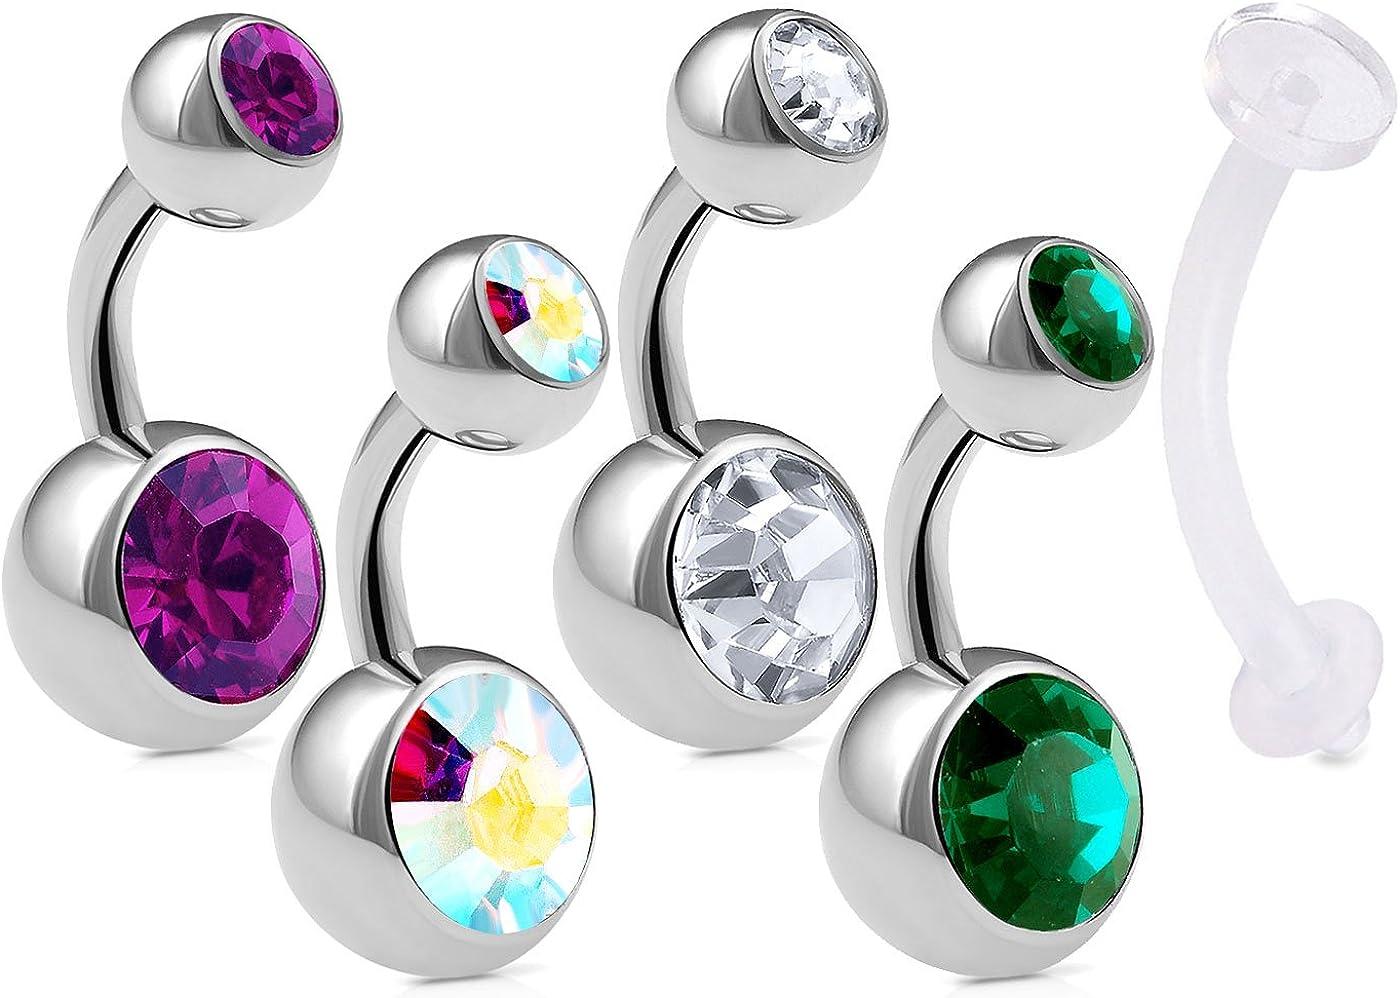 Belly Ring Body Jewelry Navel Ring Navel Jewelry Kajal Belly Button Ring Belly Button Jewelry Navel Pierceing Body Piercing